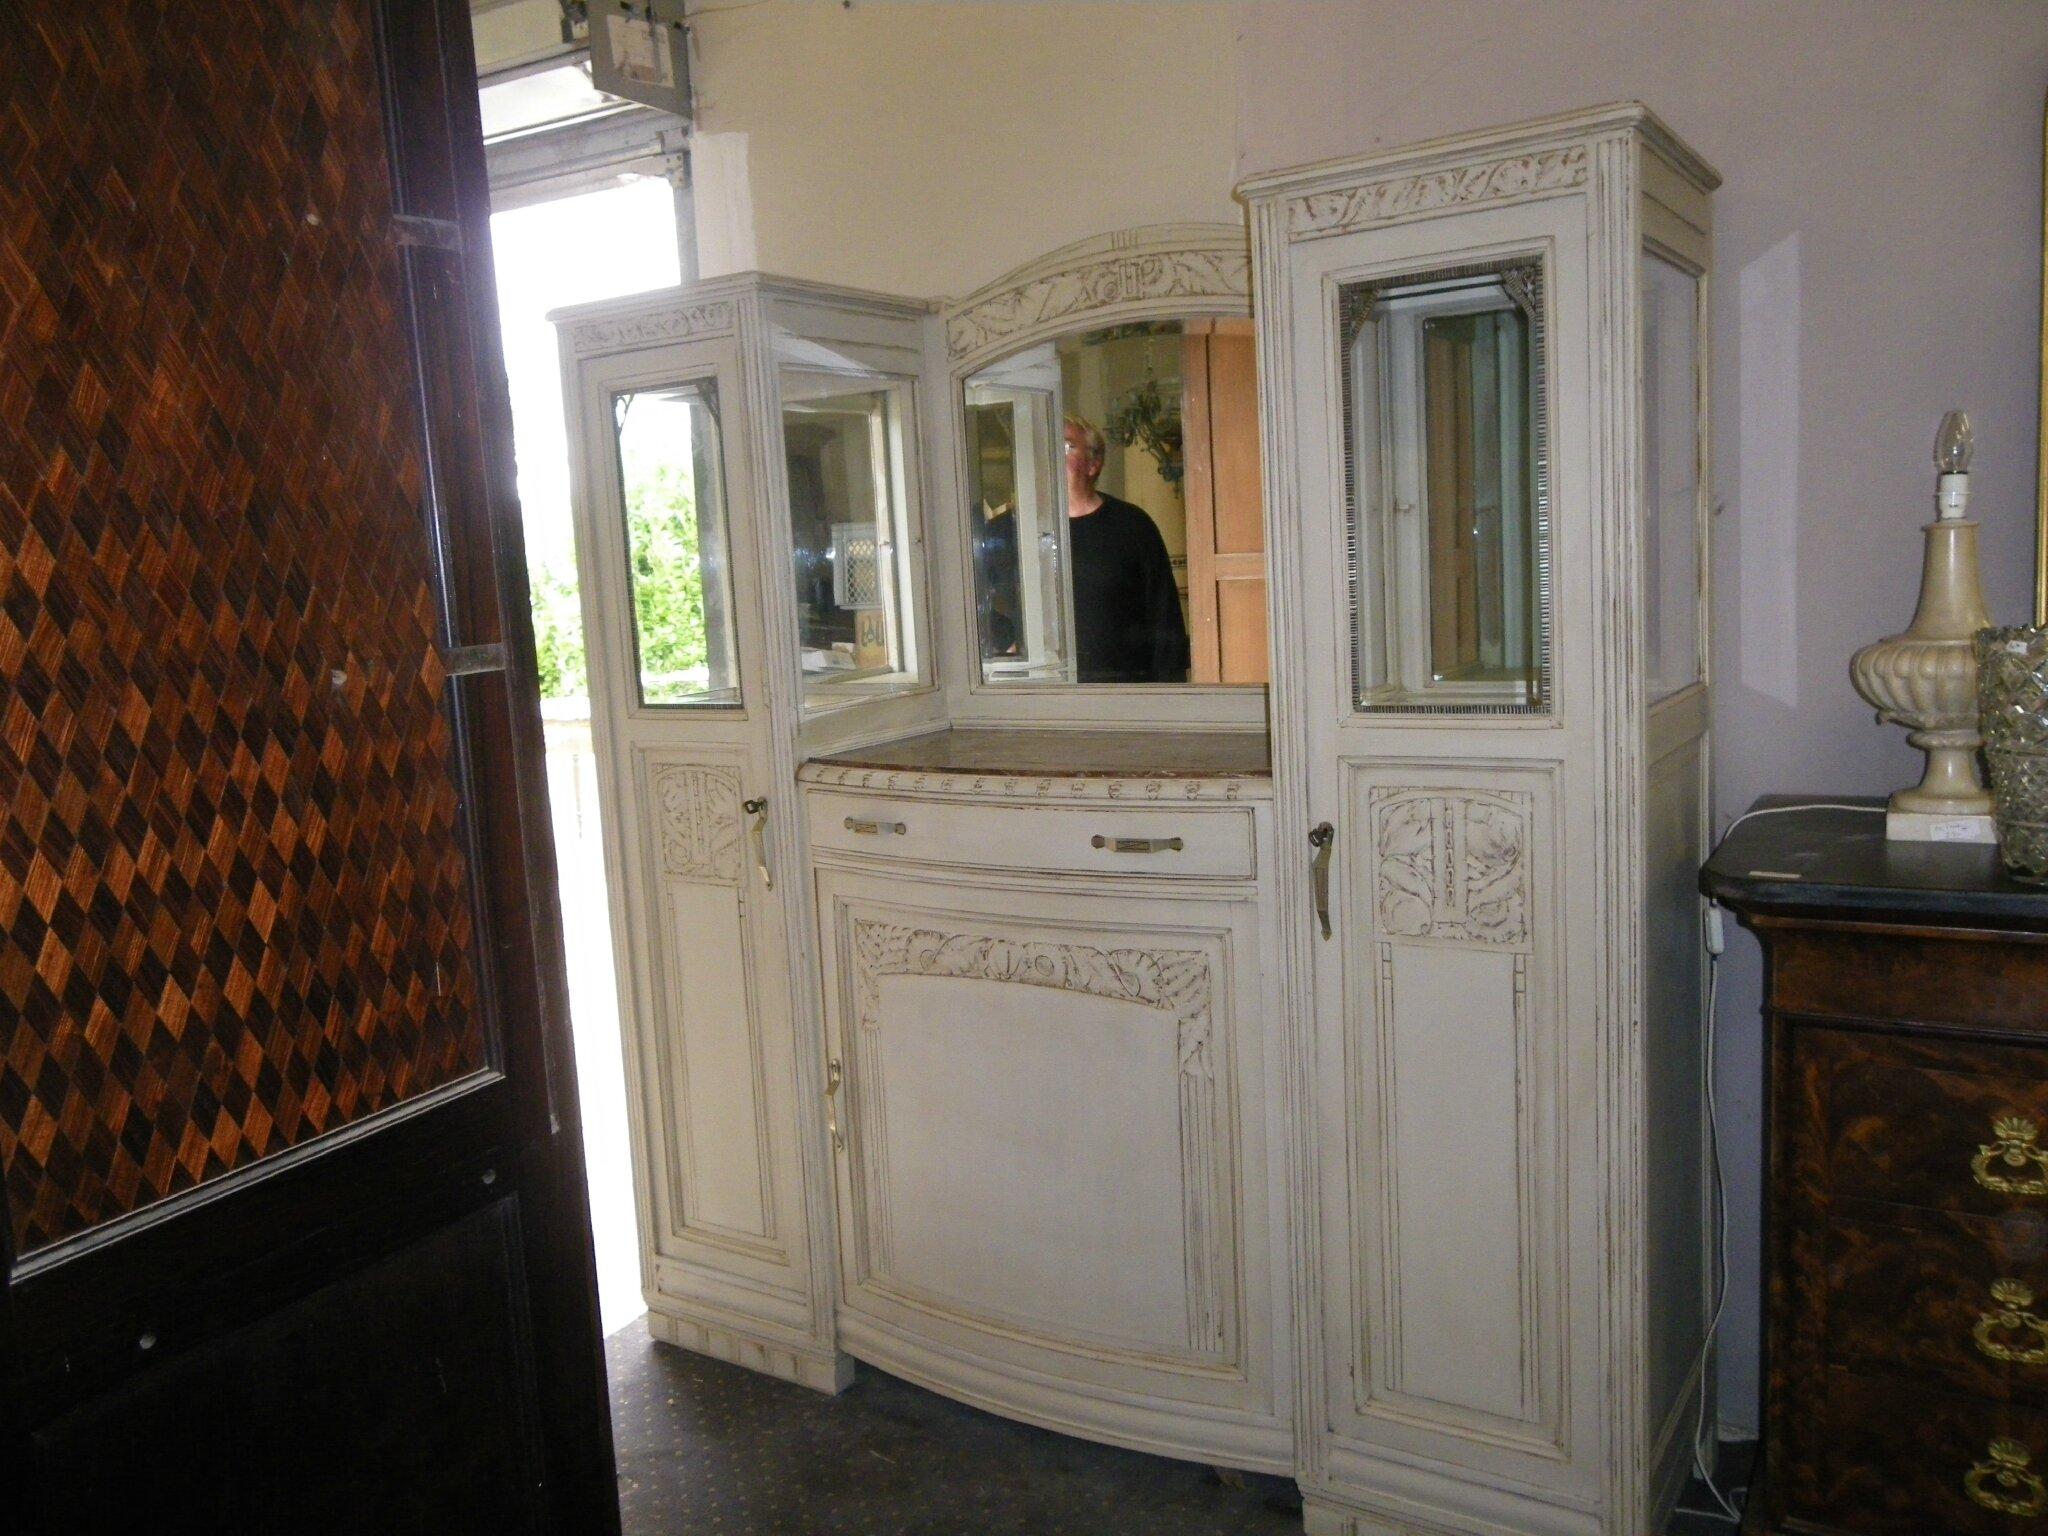 buffet vitrine rechampi epoque art deco 650 euros antiquites alain darracq. Black Bedroom Furniture Sets. Home Design Ideas